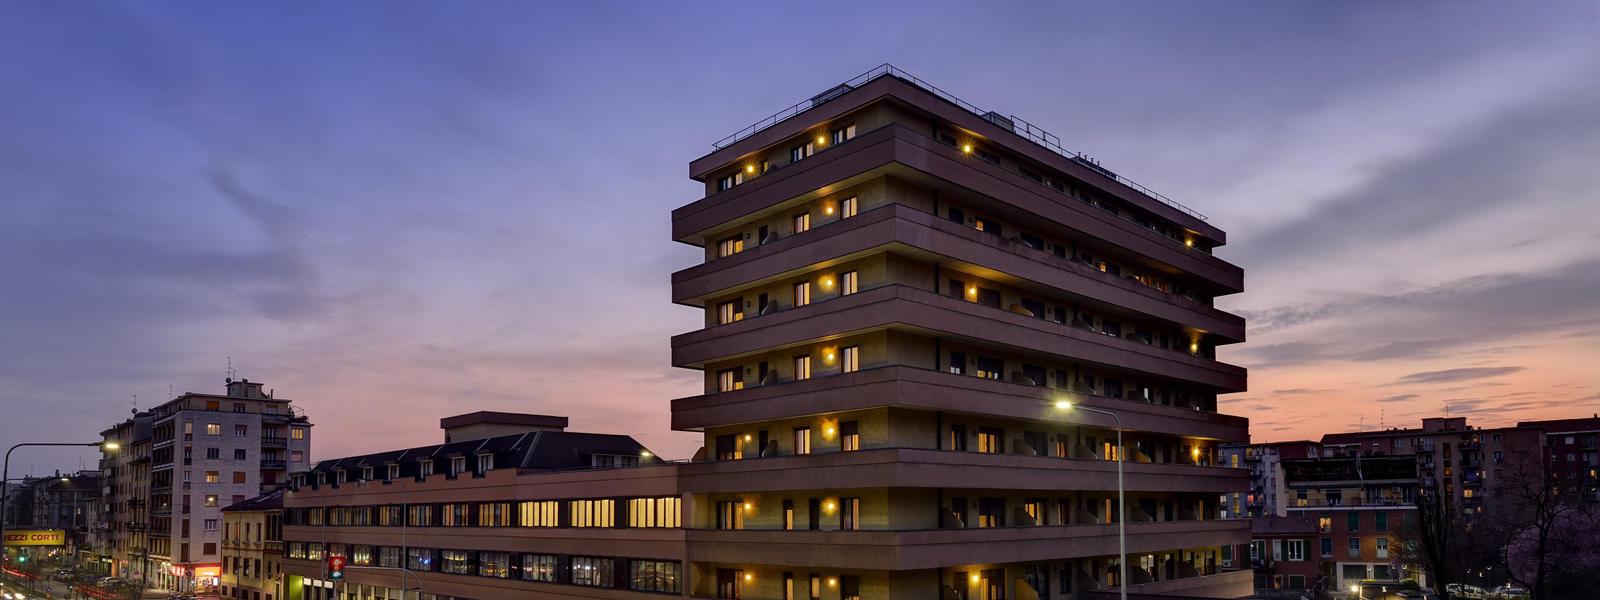 Linea Uno Hotel & Residence Milano